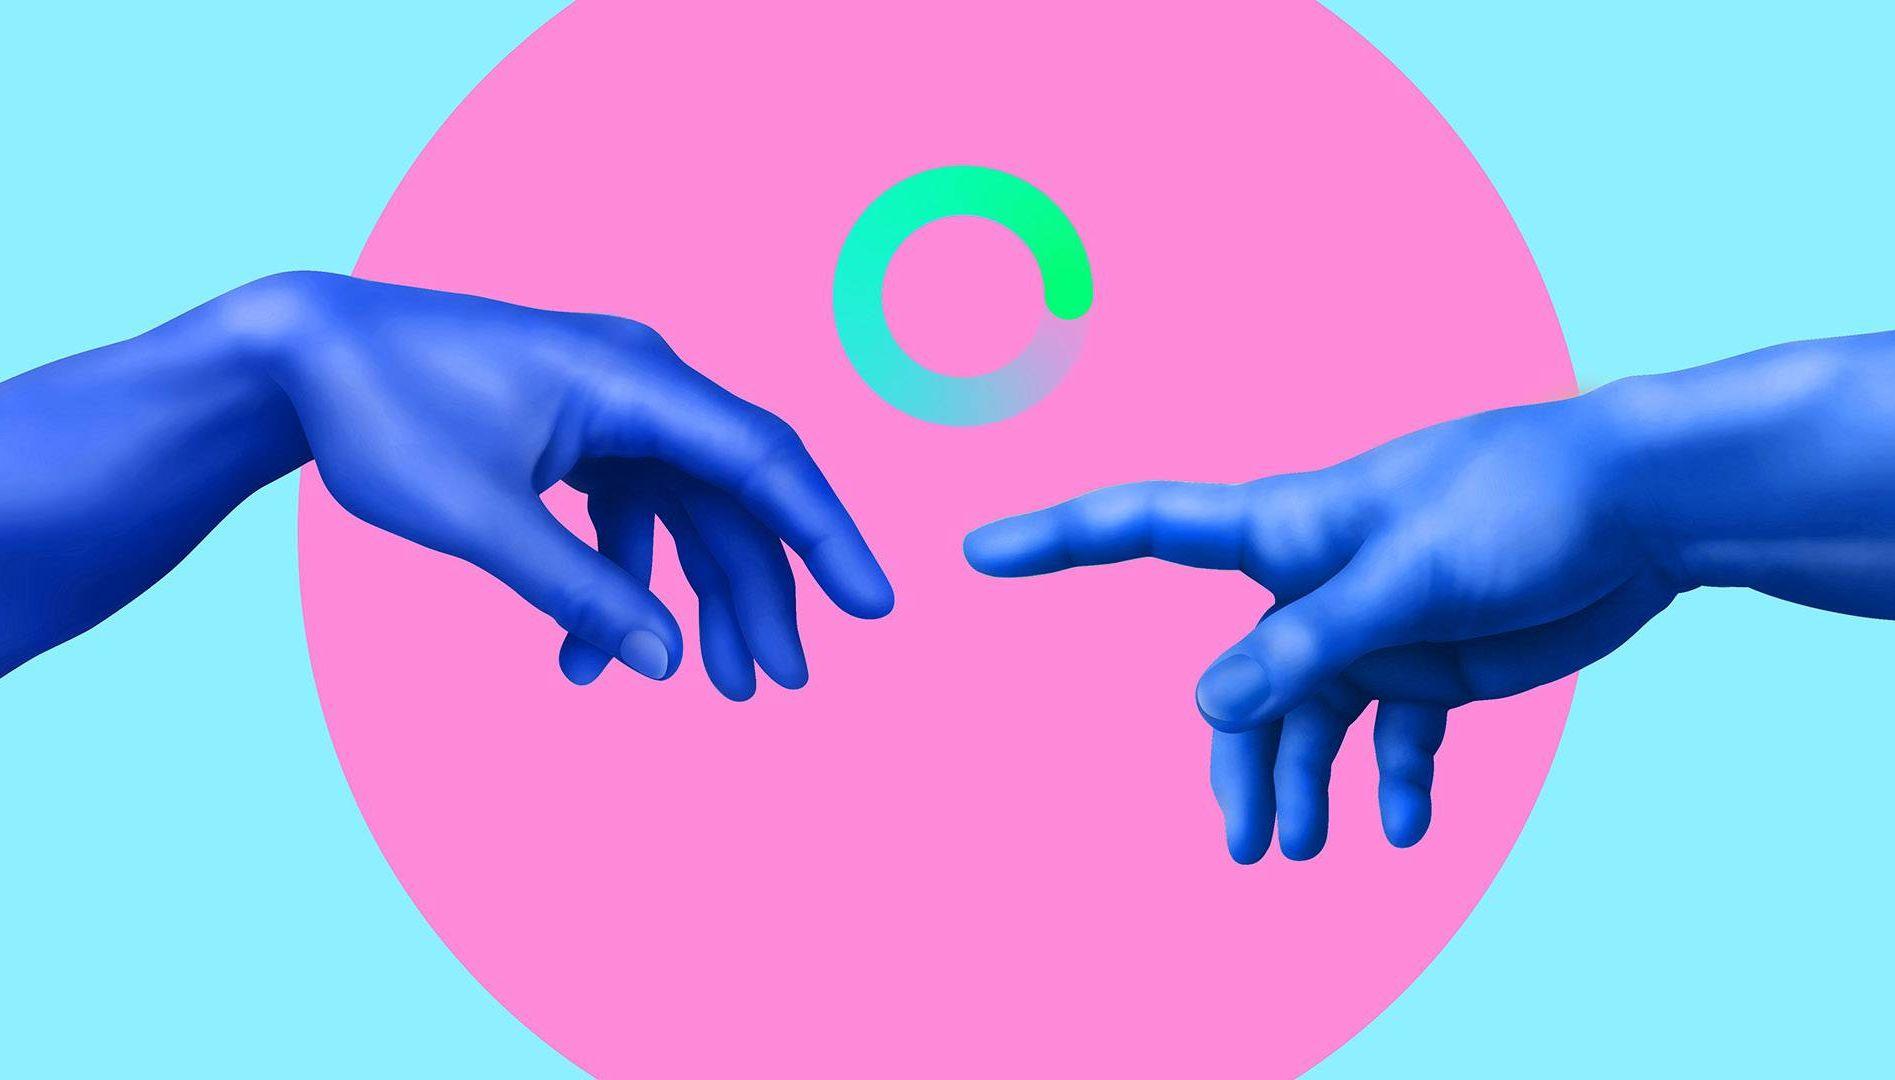 creation of Adam. rewire pbs love health touch, pandemic